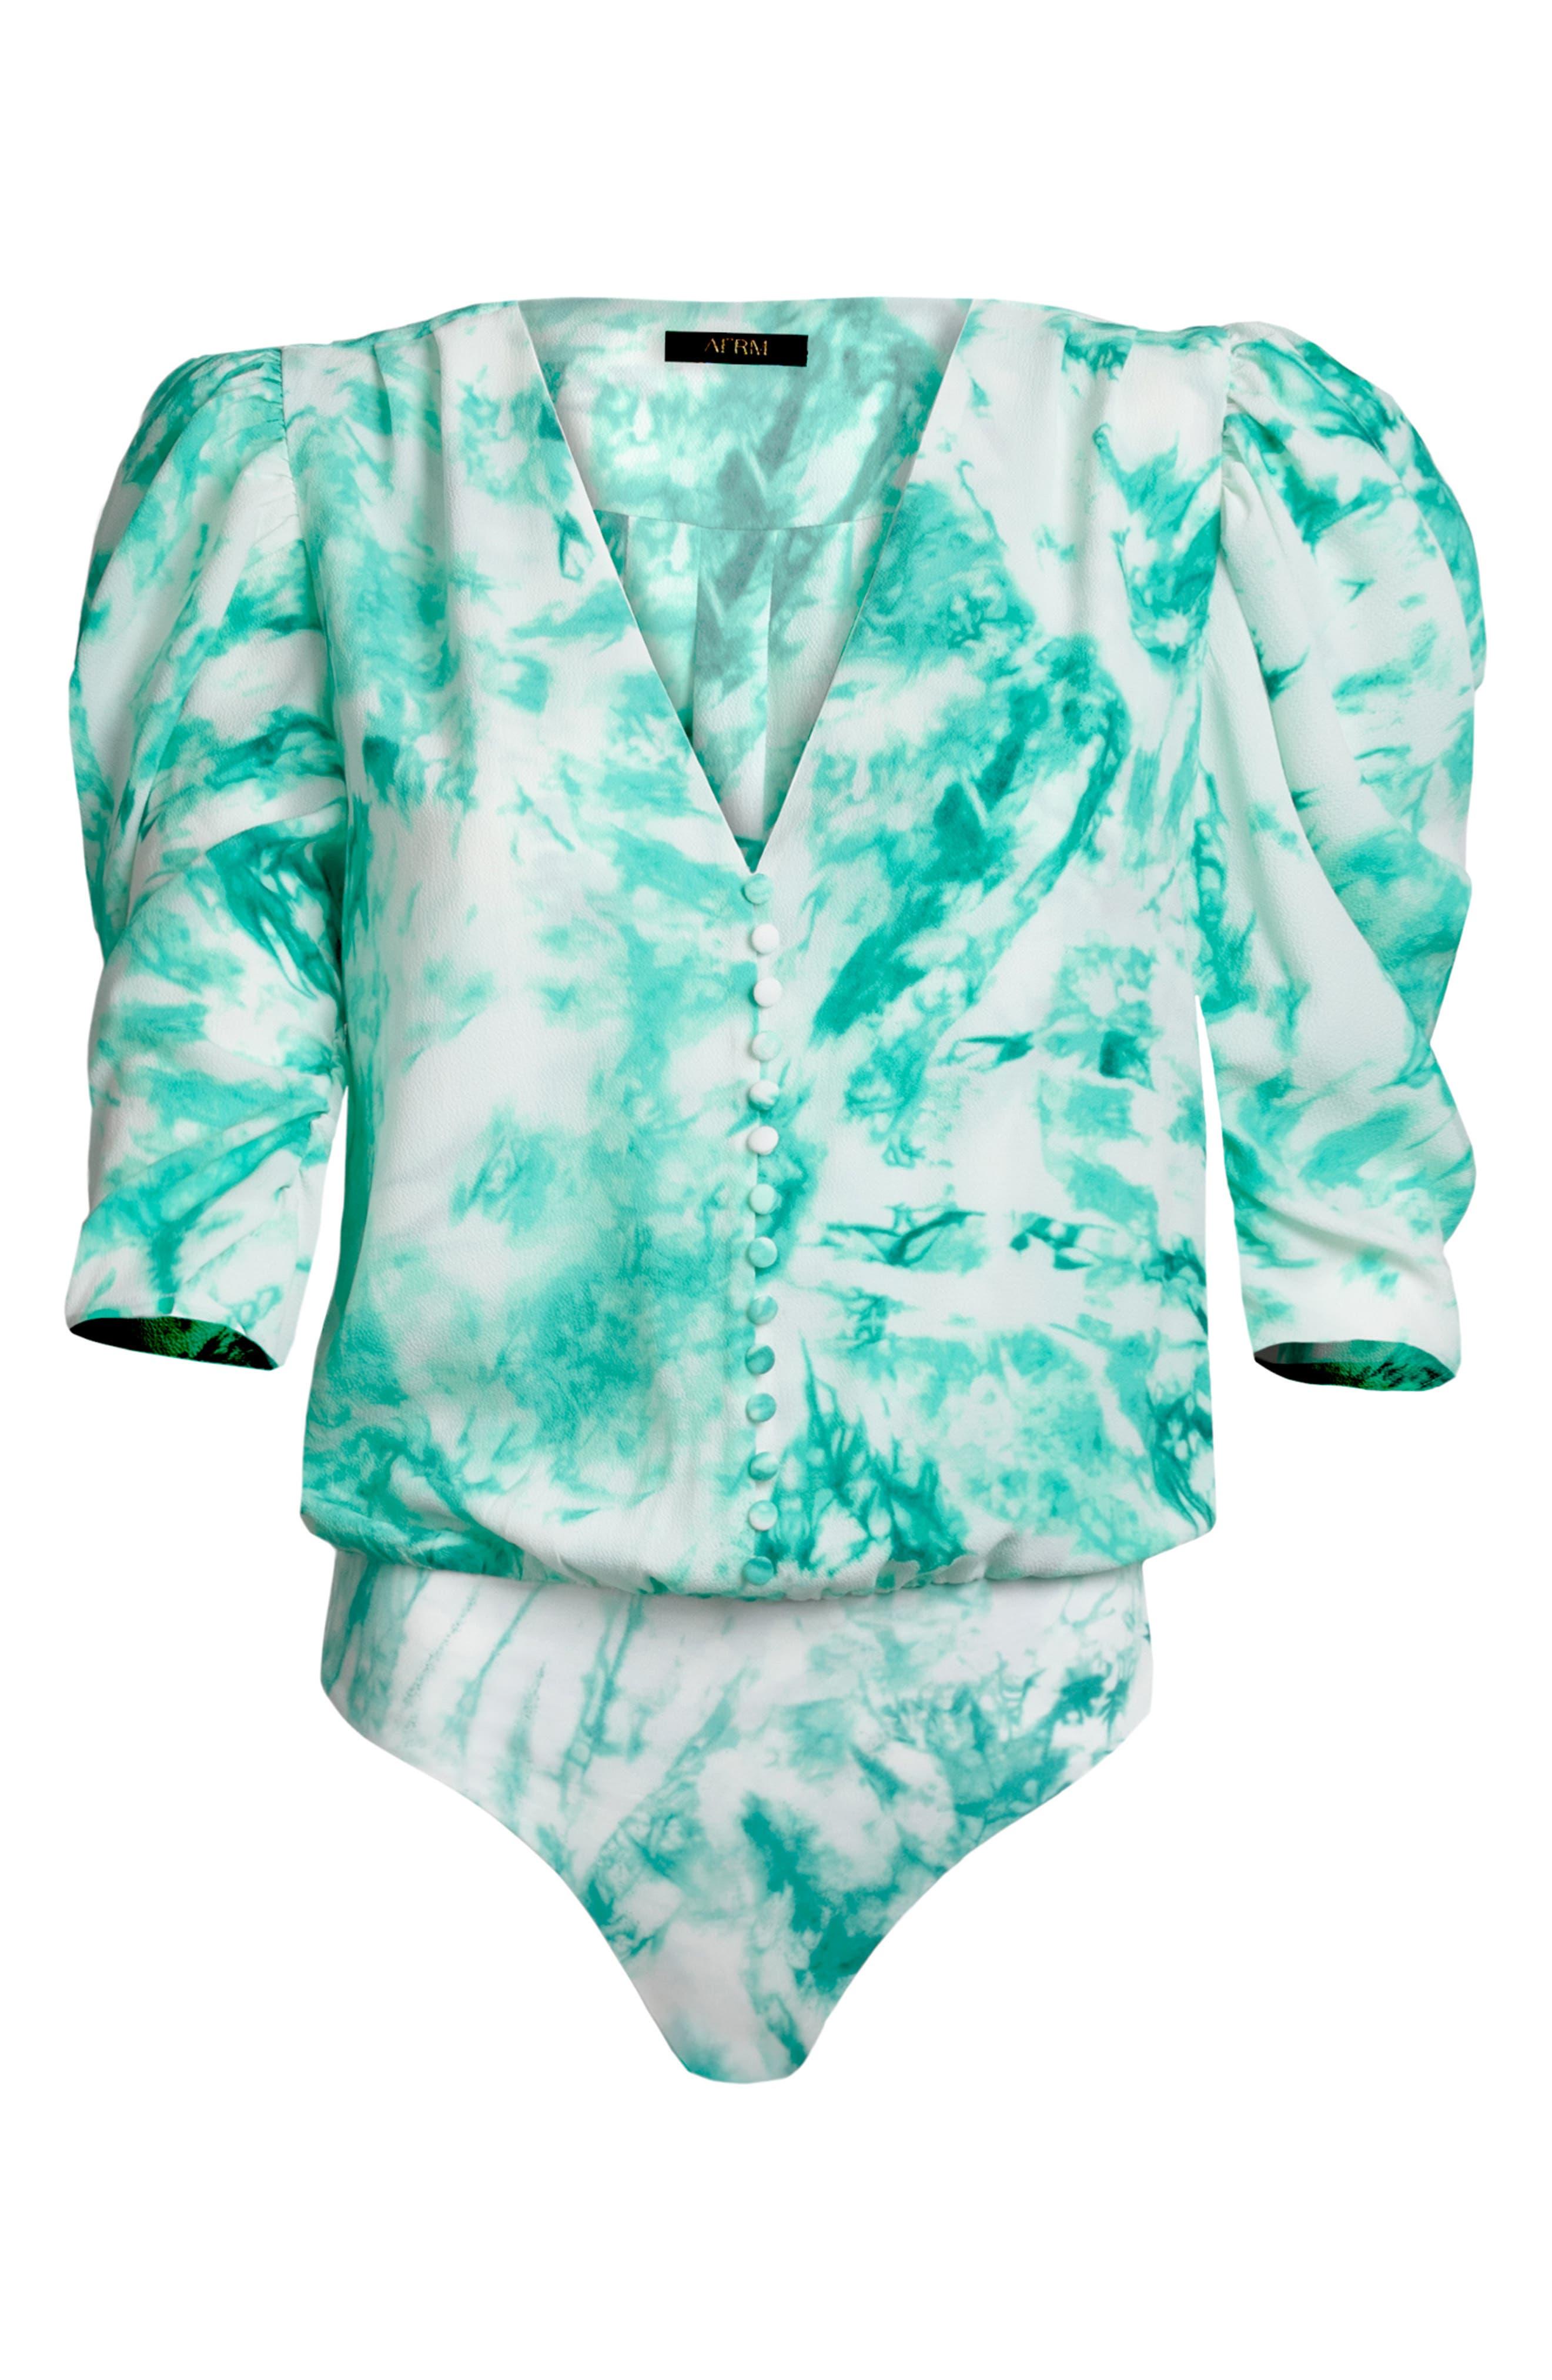 Foxy Puff Sleeve Bodysuit